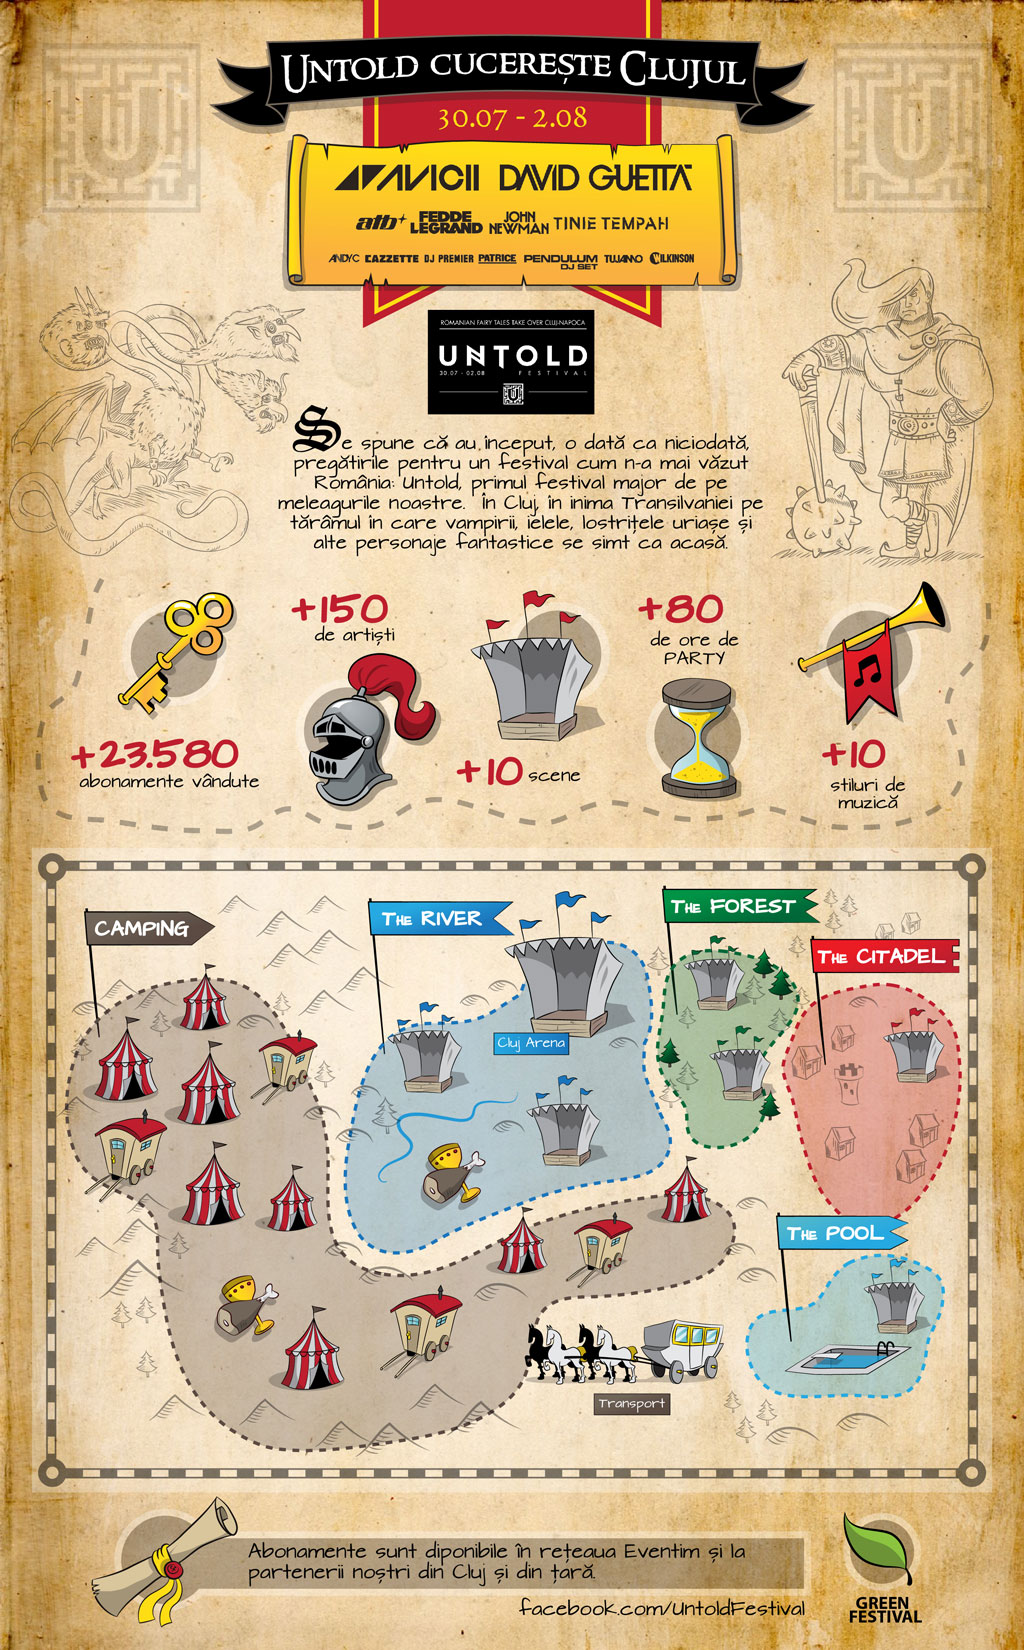 UNTOLD cucereste Clujul - infographic